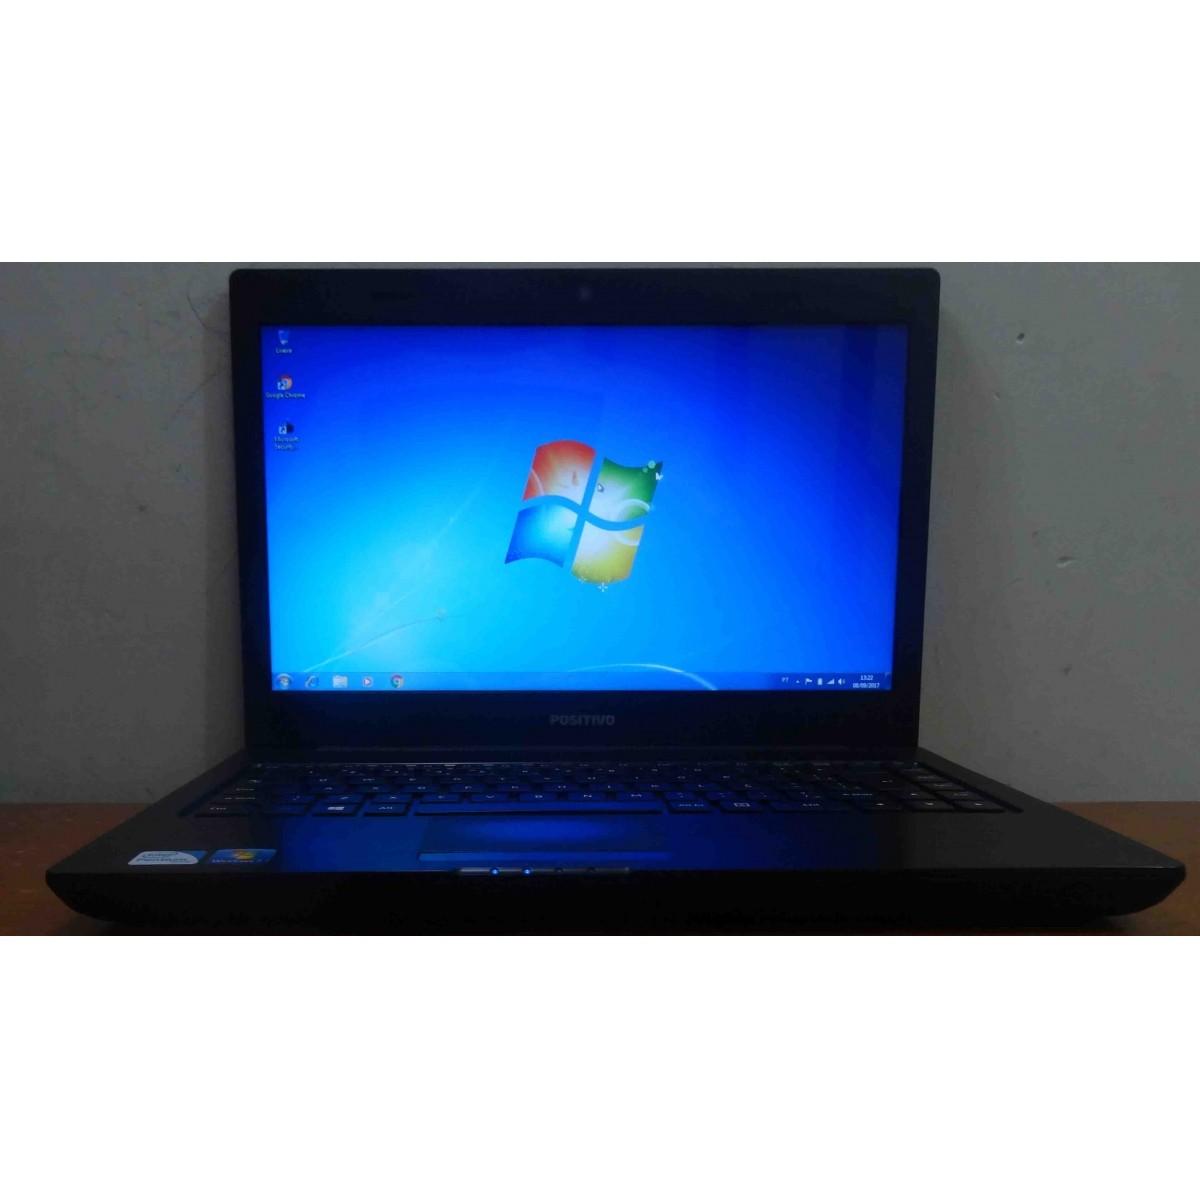 Notebook Positivo Master N110I 14'' Intel Pentium 2.1GHz 2GB HD-320GB